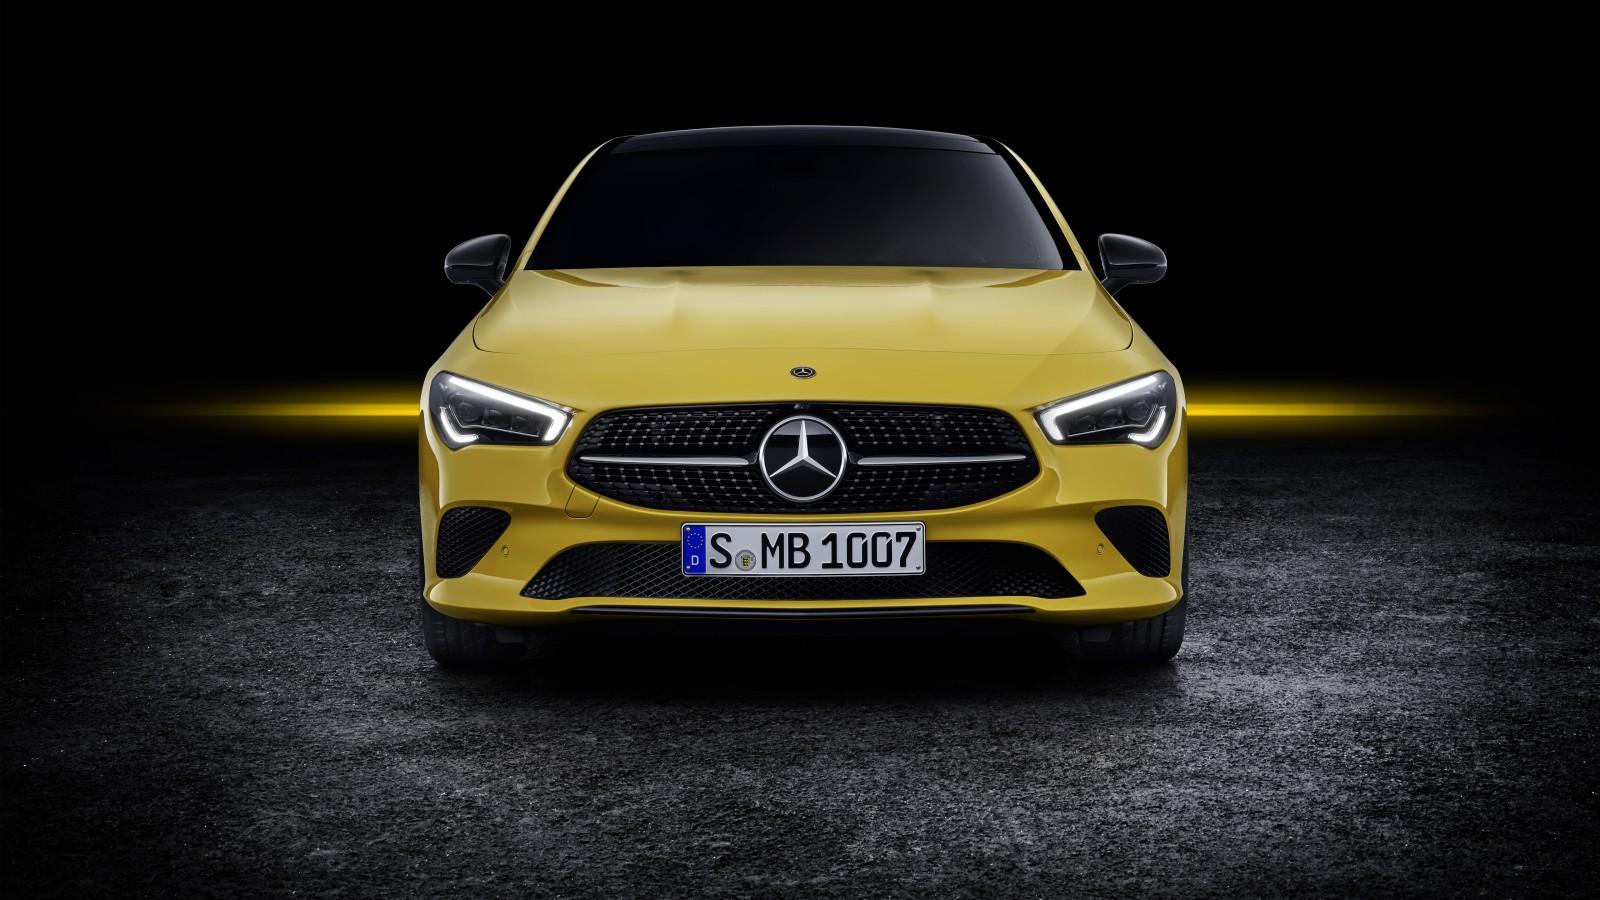 Mercedes Amg Wallpaper Iphone Mercedes Benz Cla Klasse Shooting Brake 2019 5k Wallpaper